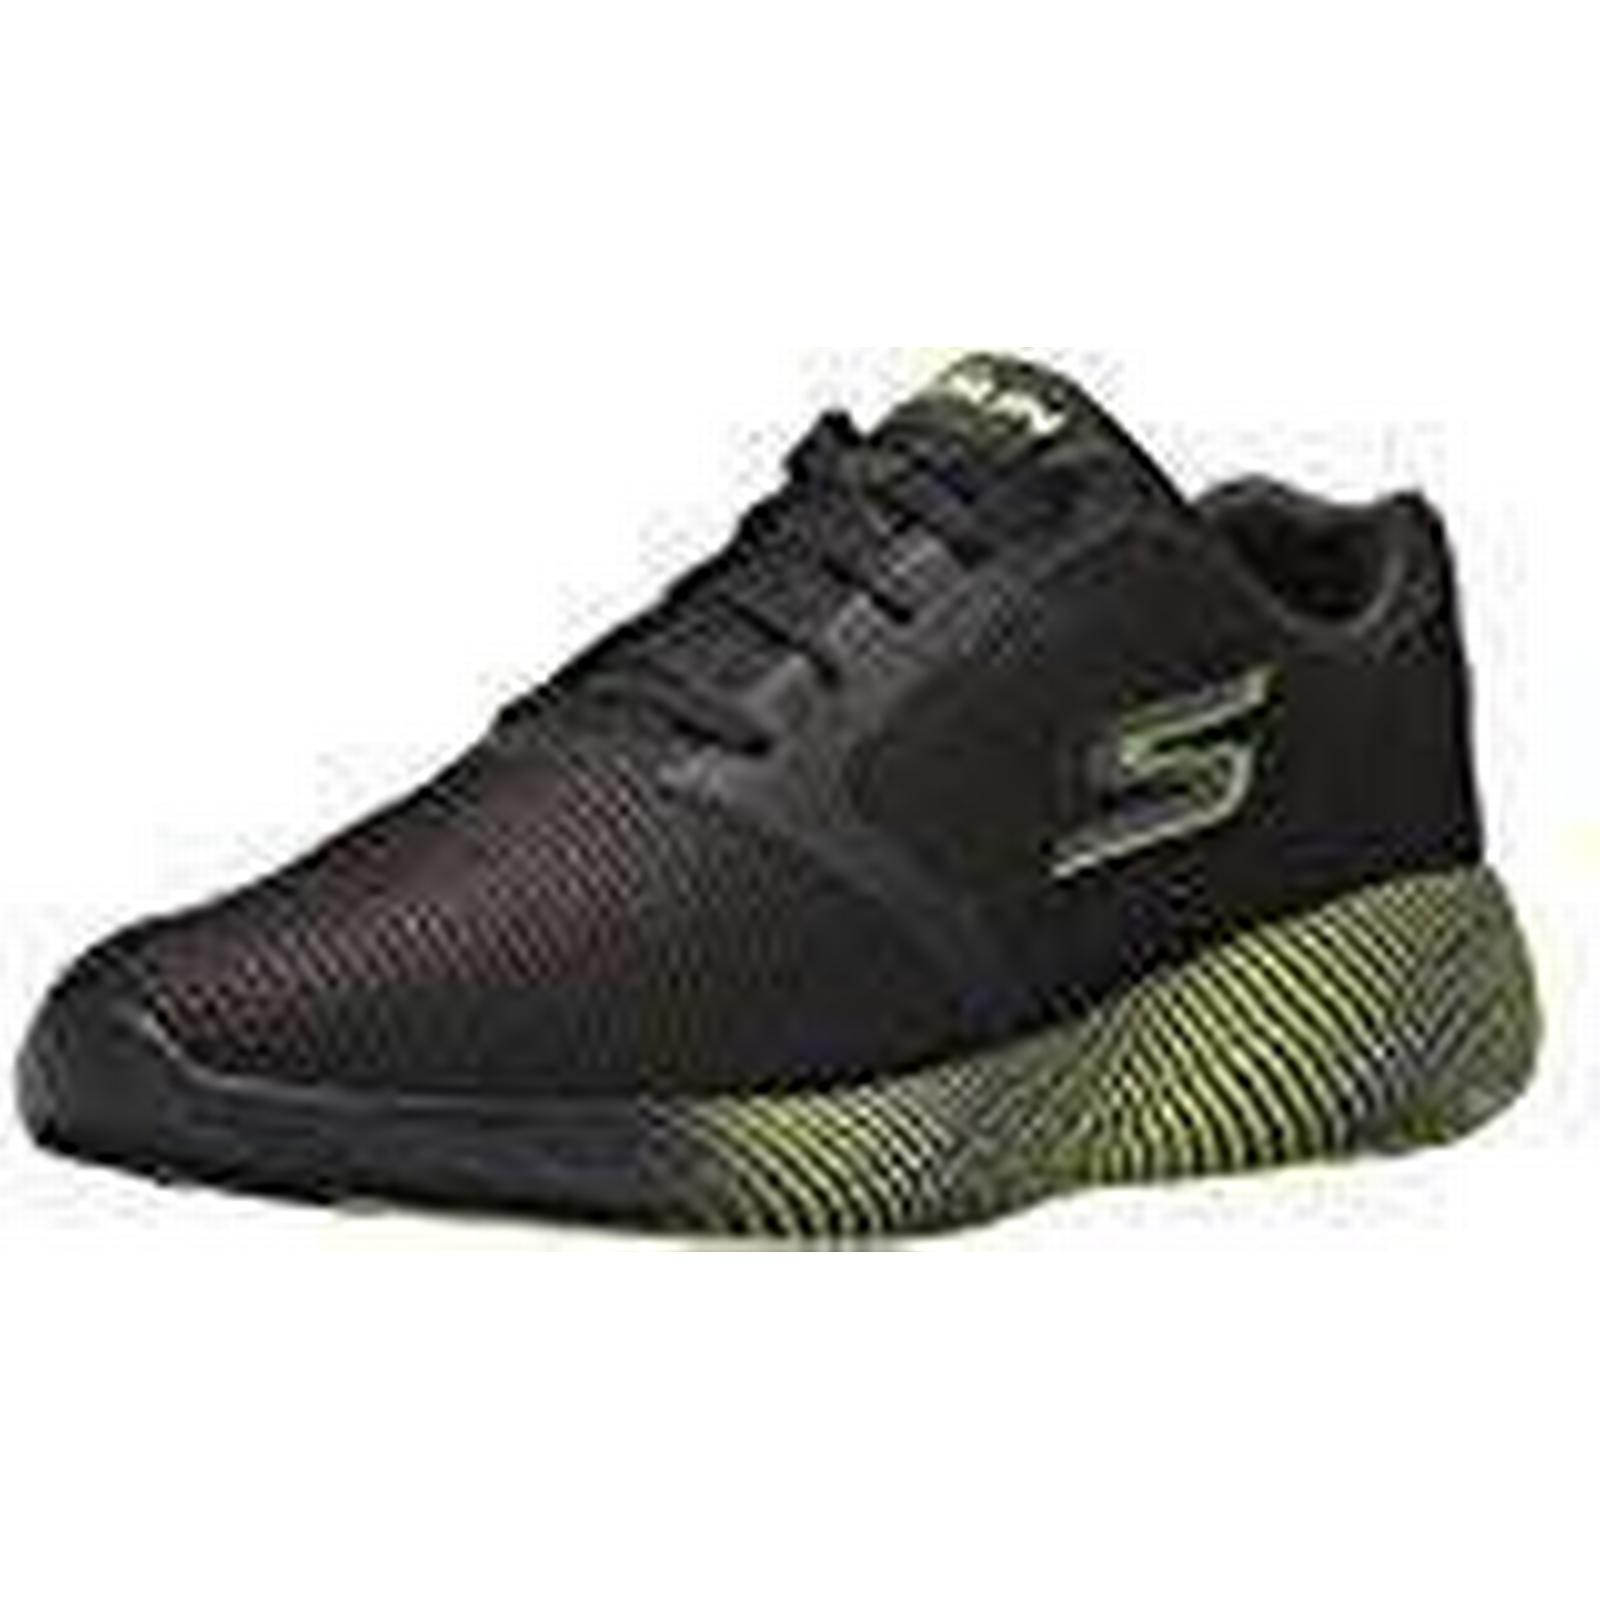 Skechers Men Go Run 600 - Spectra Fitness UK Shoes Black (Black/Lime) 11 UK Fitness 45.5 EU e2fc2a